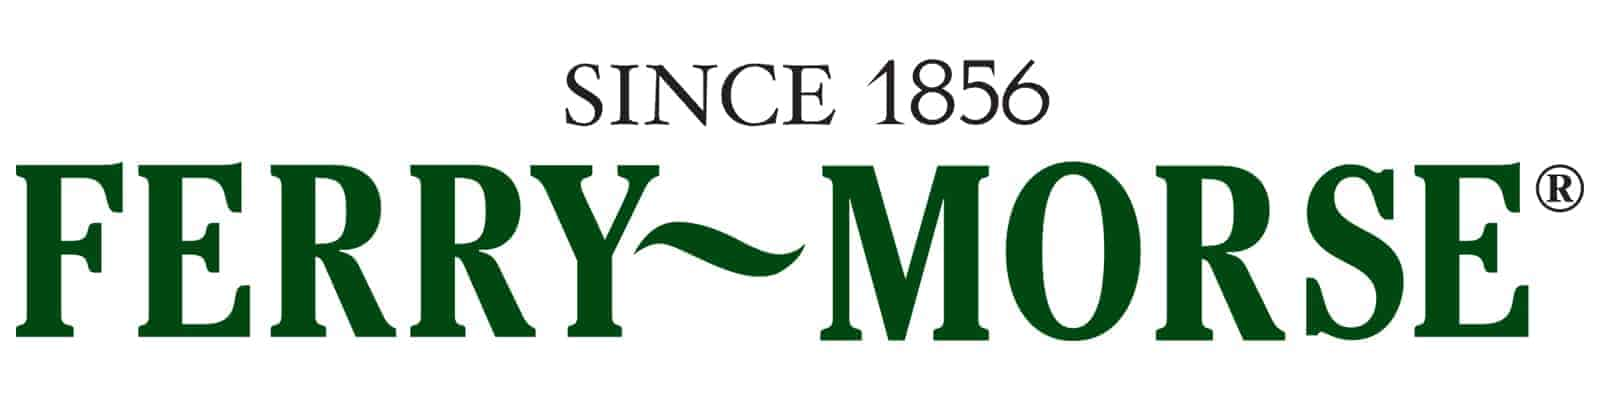 Ferry-Morse logo